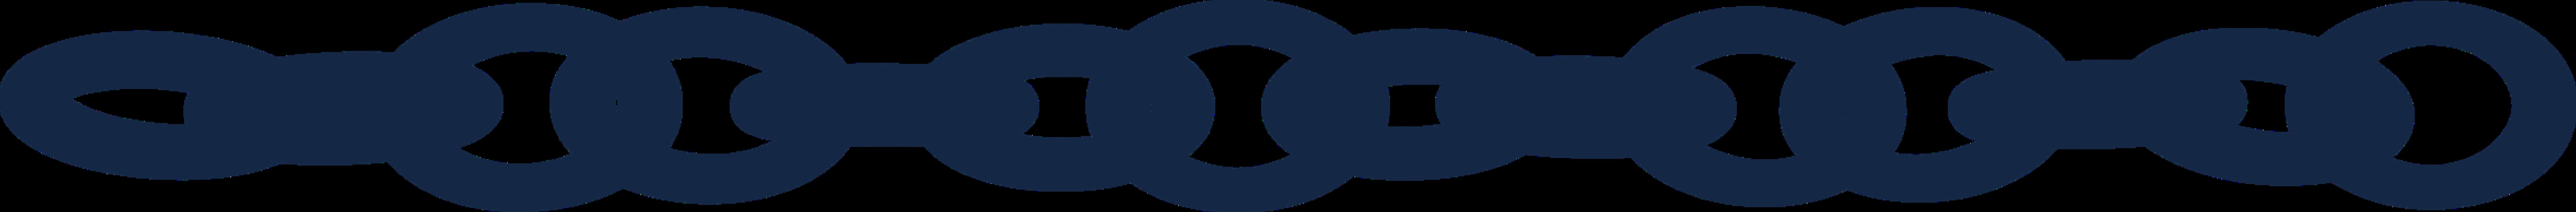 Text,Brand,Logo Clipart - Royalty Free SVG / Transparent